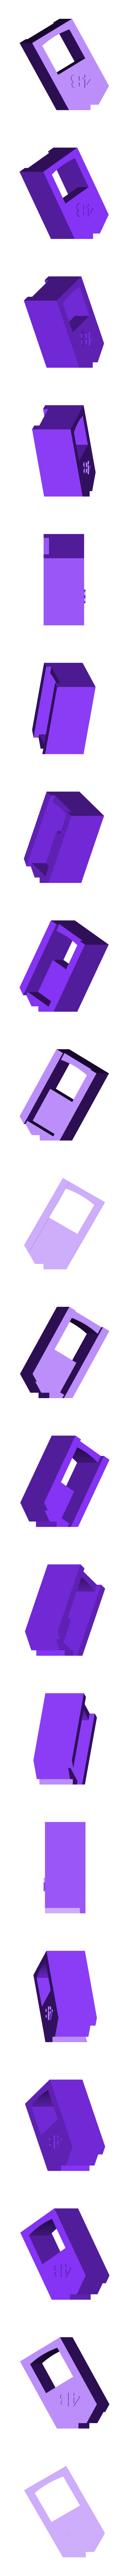 lathe xtn block vS4mm (4B).stl Download free STL file lathe chuck clamp for small parts • 3D print object, vintage-lens